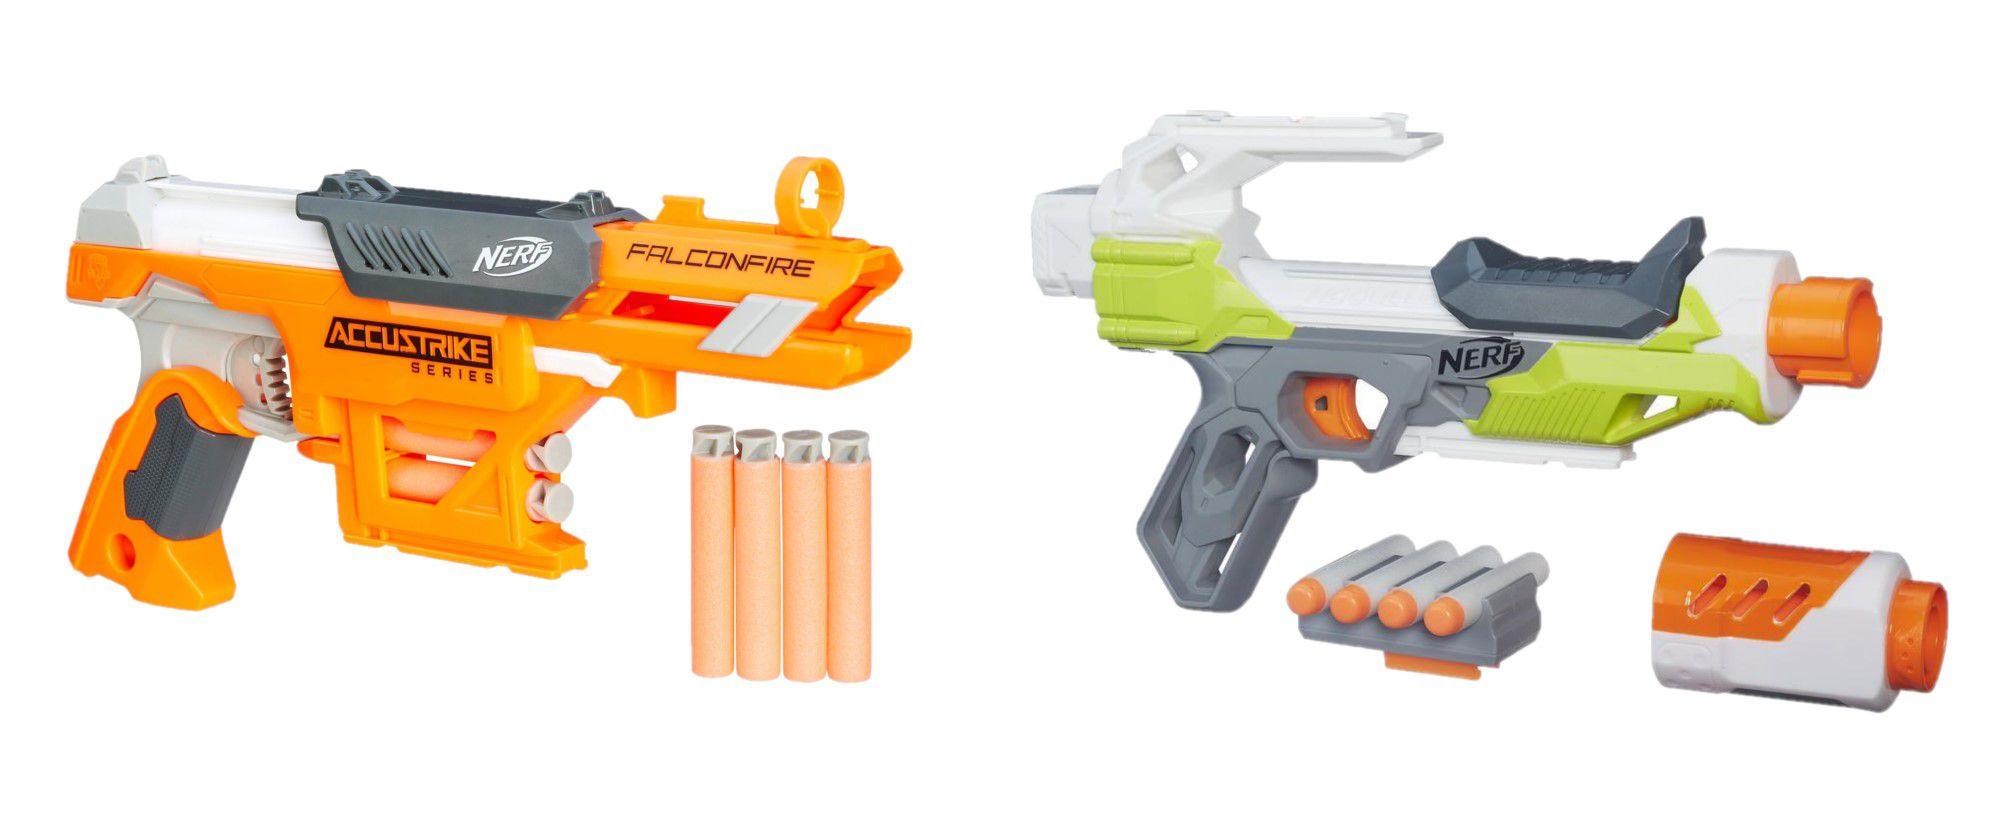 Pack Nerf Modulus Ionfire B4618 + Nerf Falconfire B9840 - Hasbro